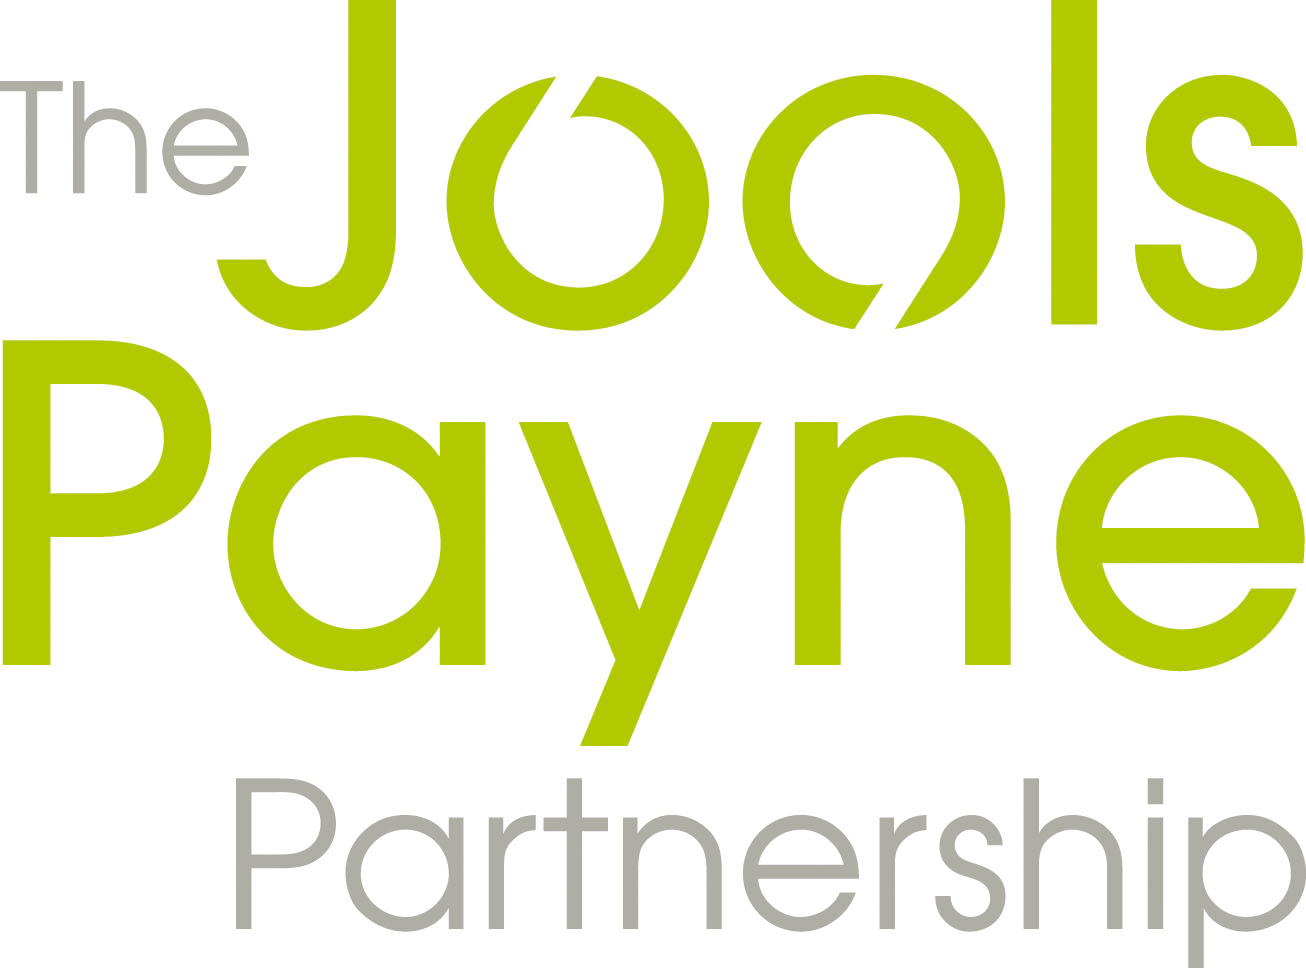 The Jools Payne Partnership Ltd